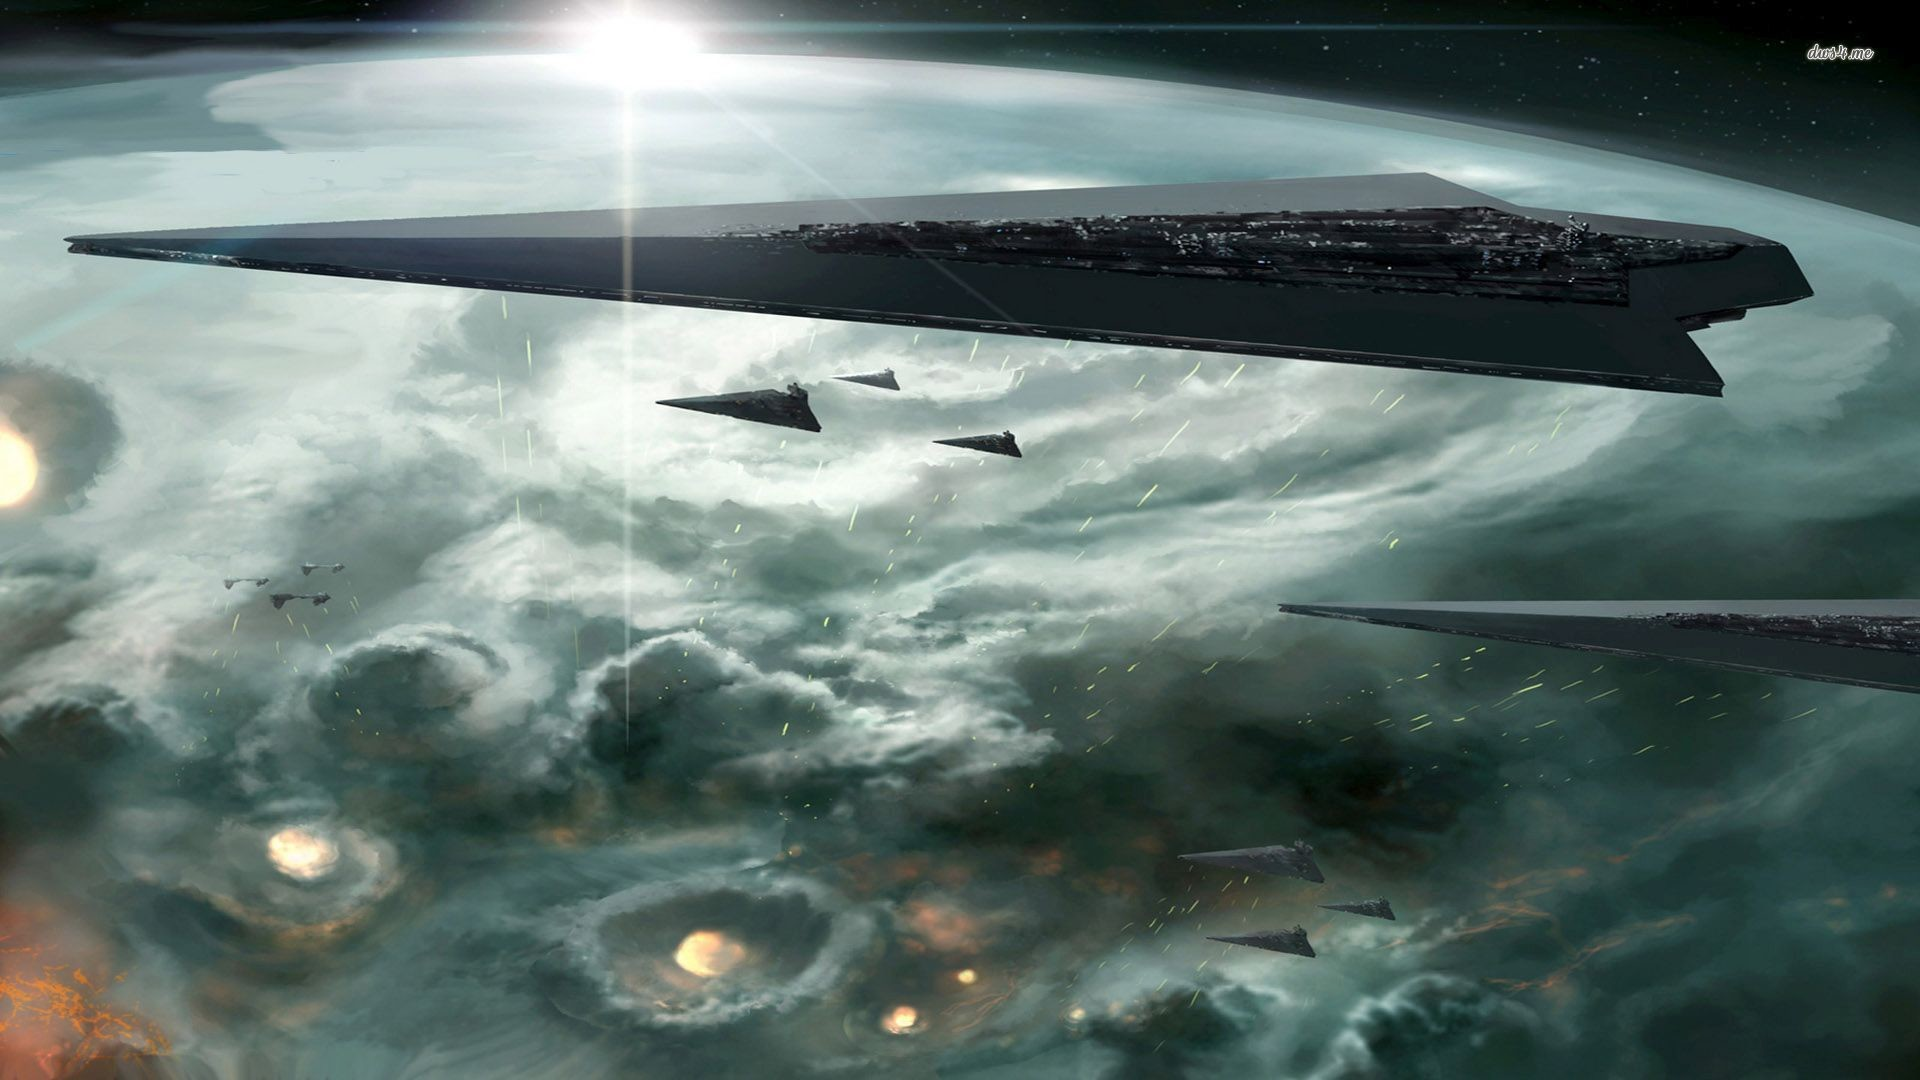 Star Wars Imperial Star Destroyer wallpaper – Movie wallpapers .